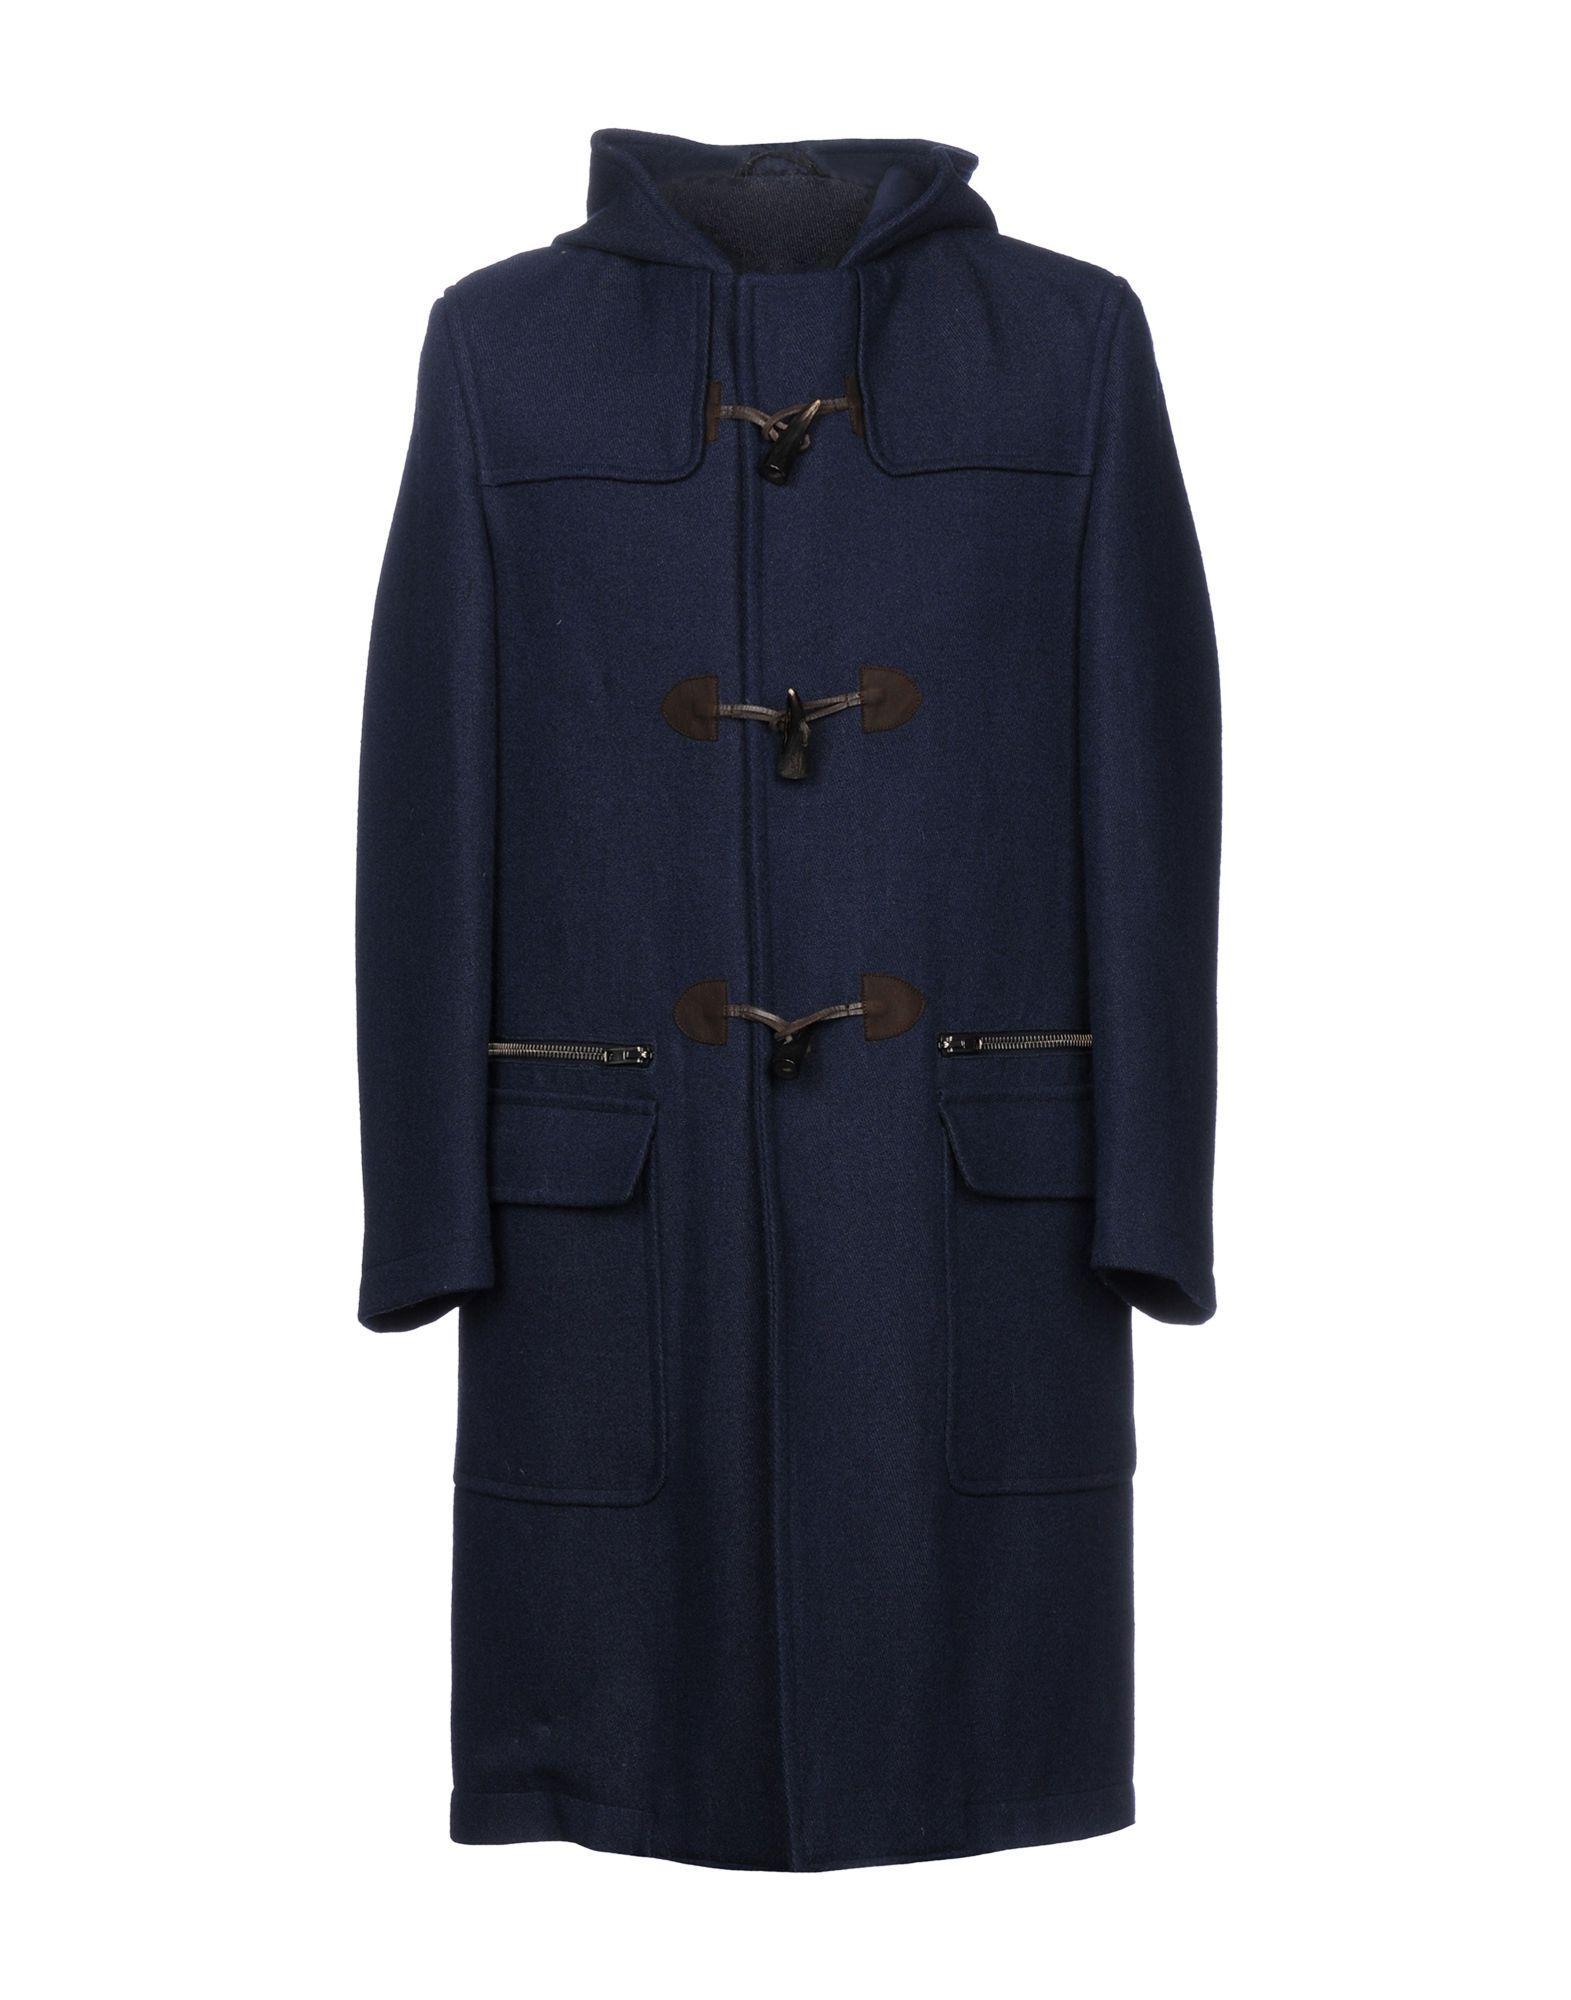 Umit Benan Coat In Dark Blue